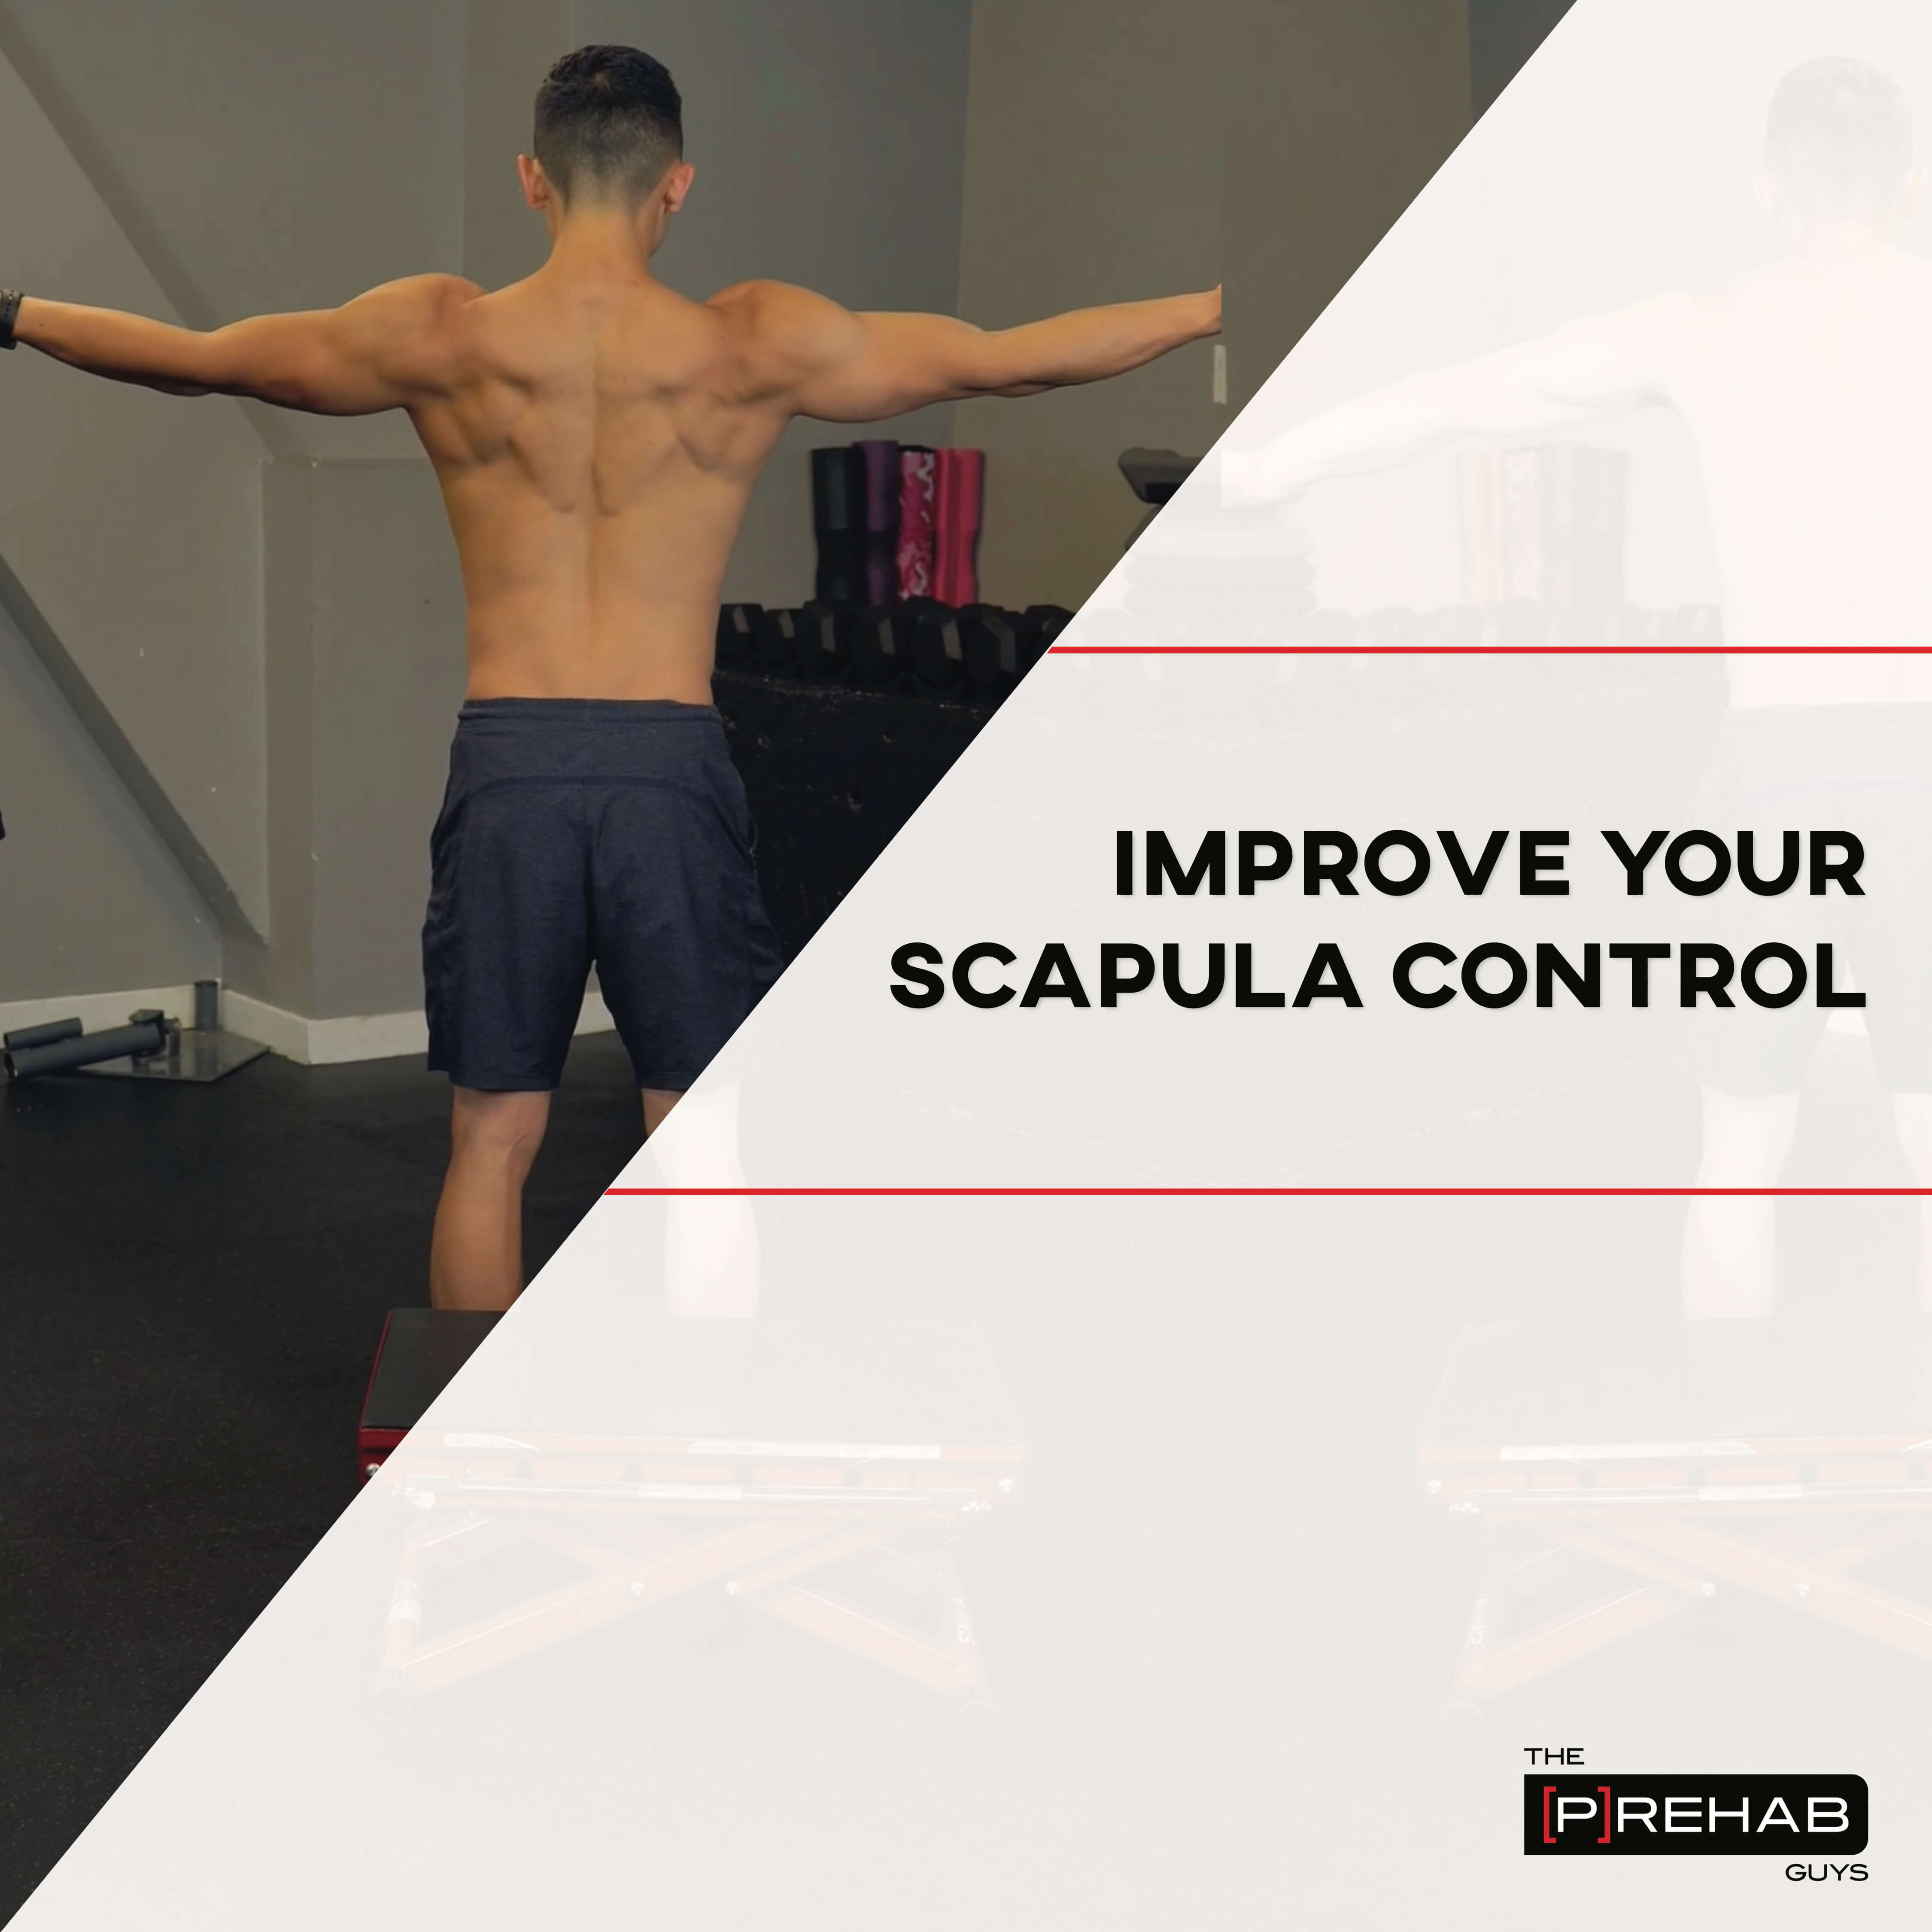 Improve Your Scapula Control - INSTAGRAM